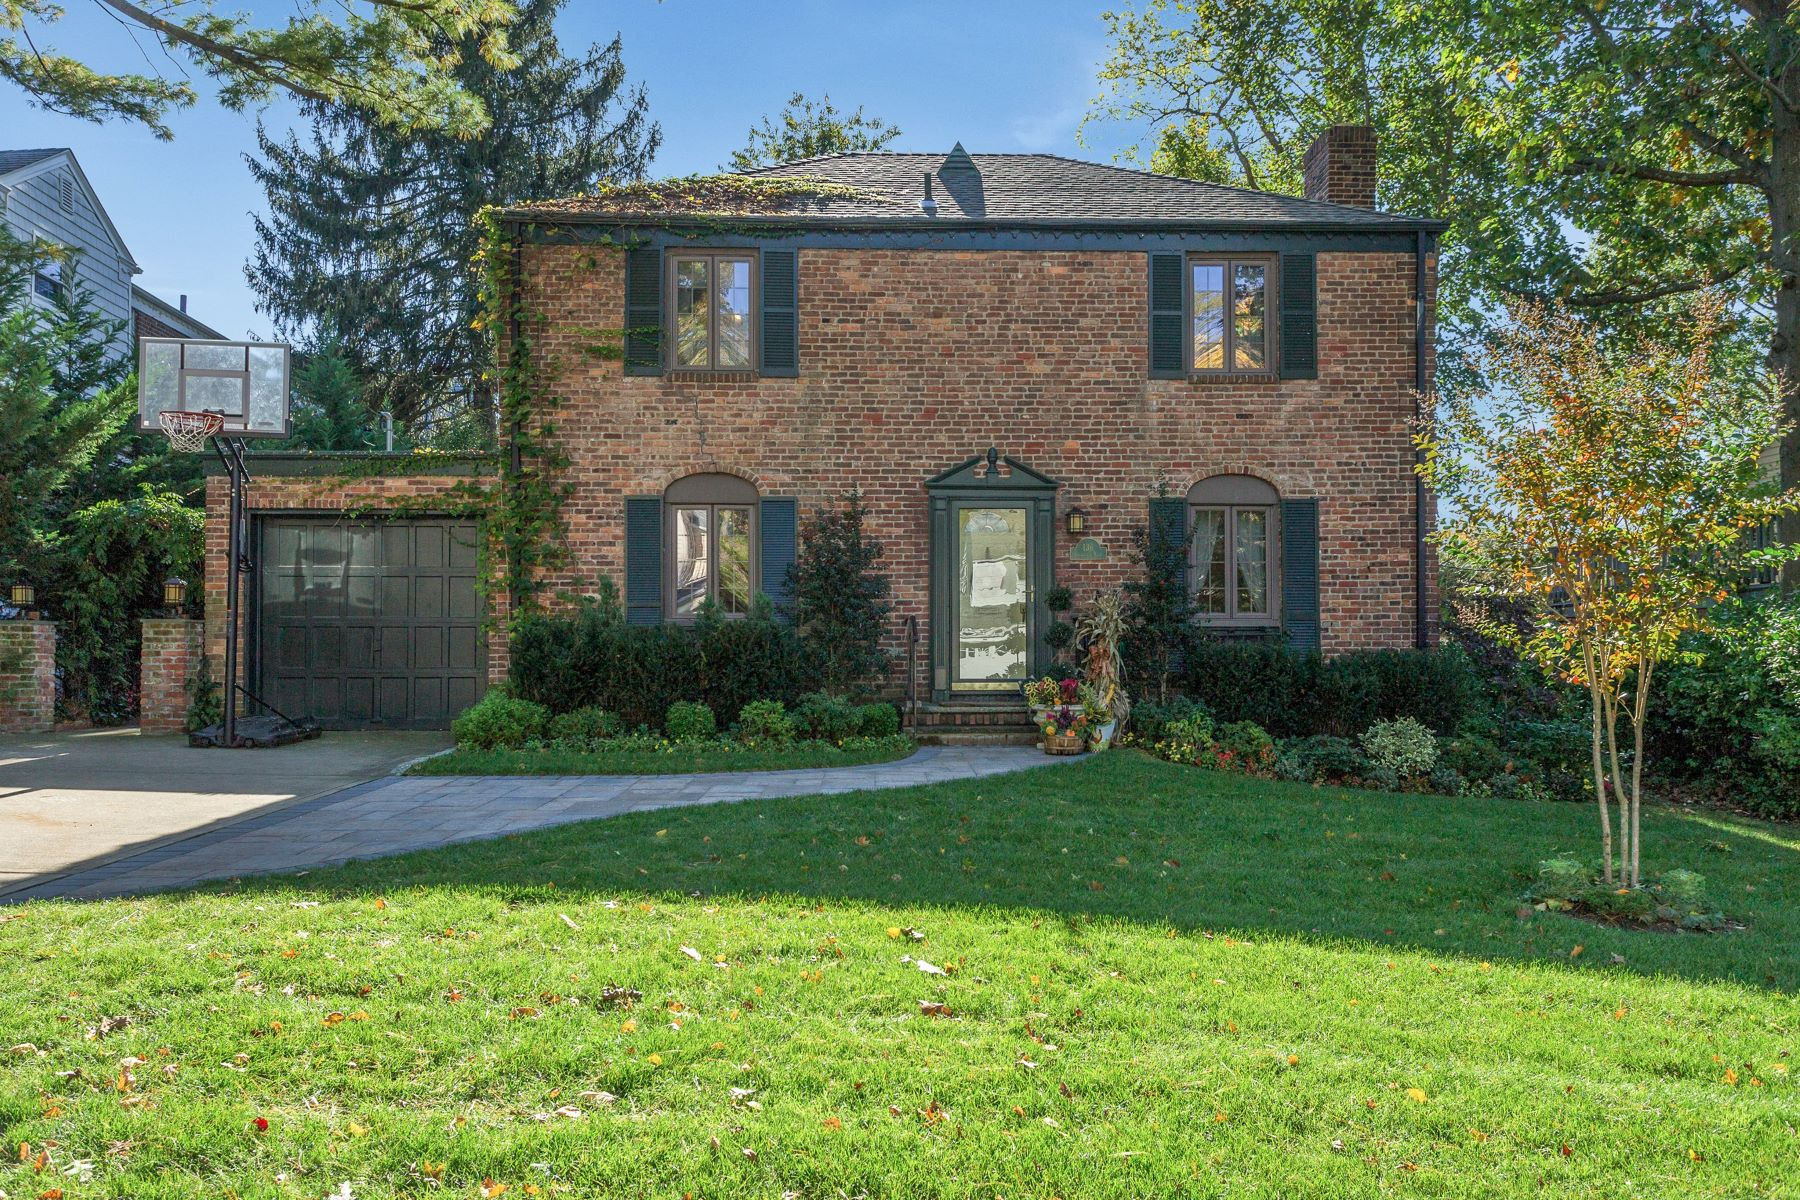 獨棟家庭住宅 為 出售 在 136 Shoreview Rd , Manhasset, NY 11030 Manhasset, 紐約州, 11030 美國